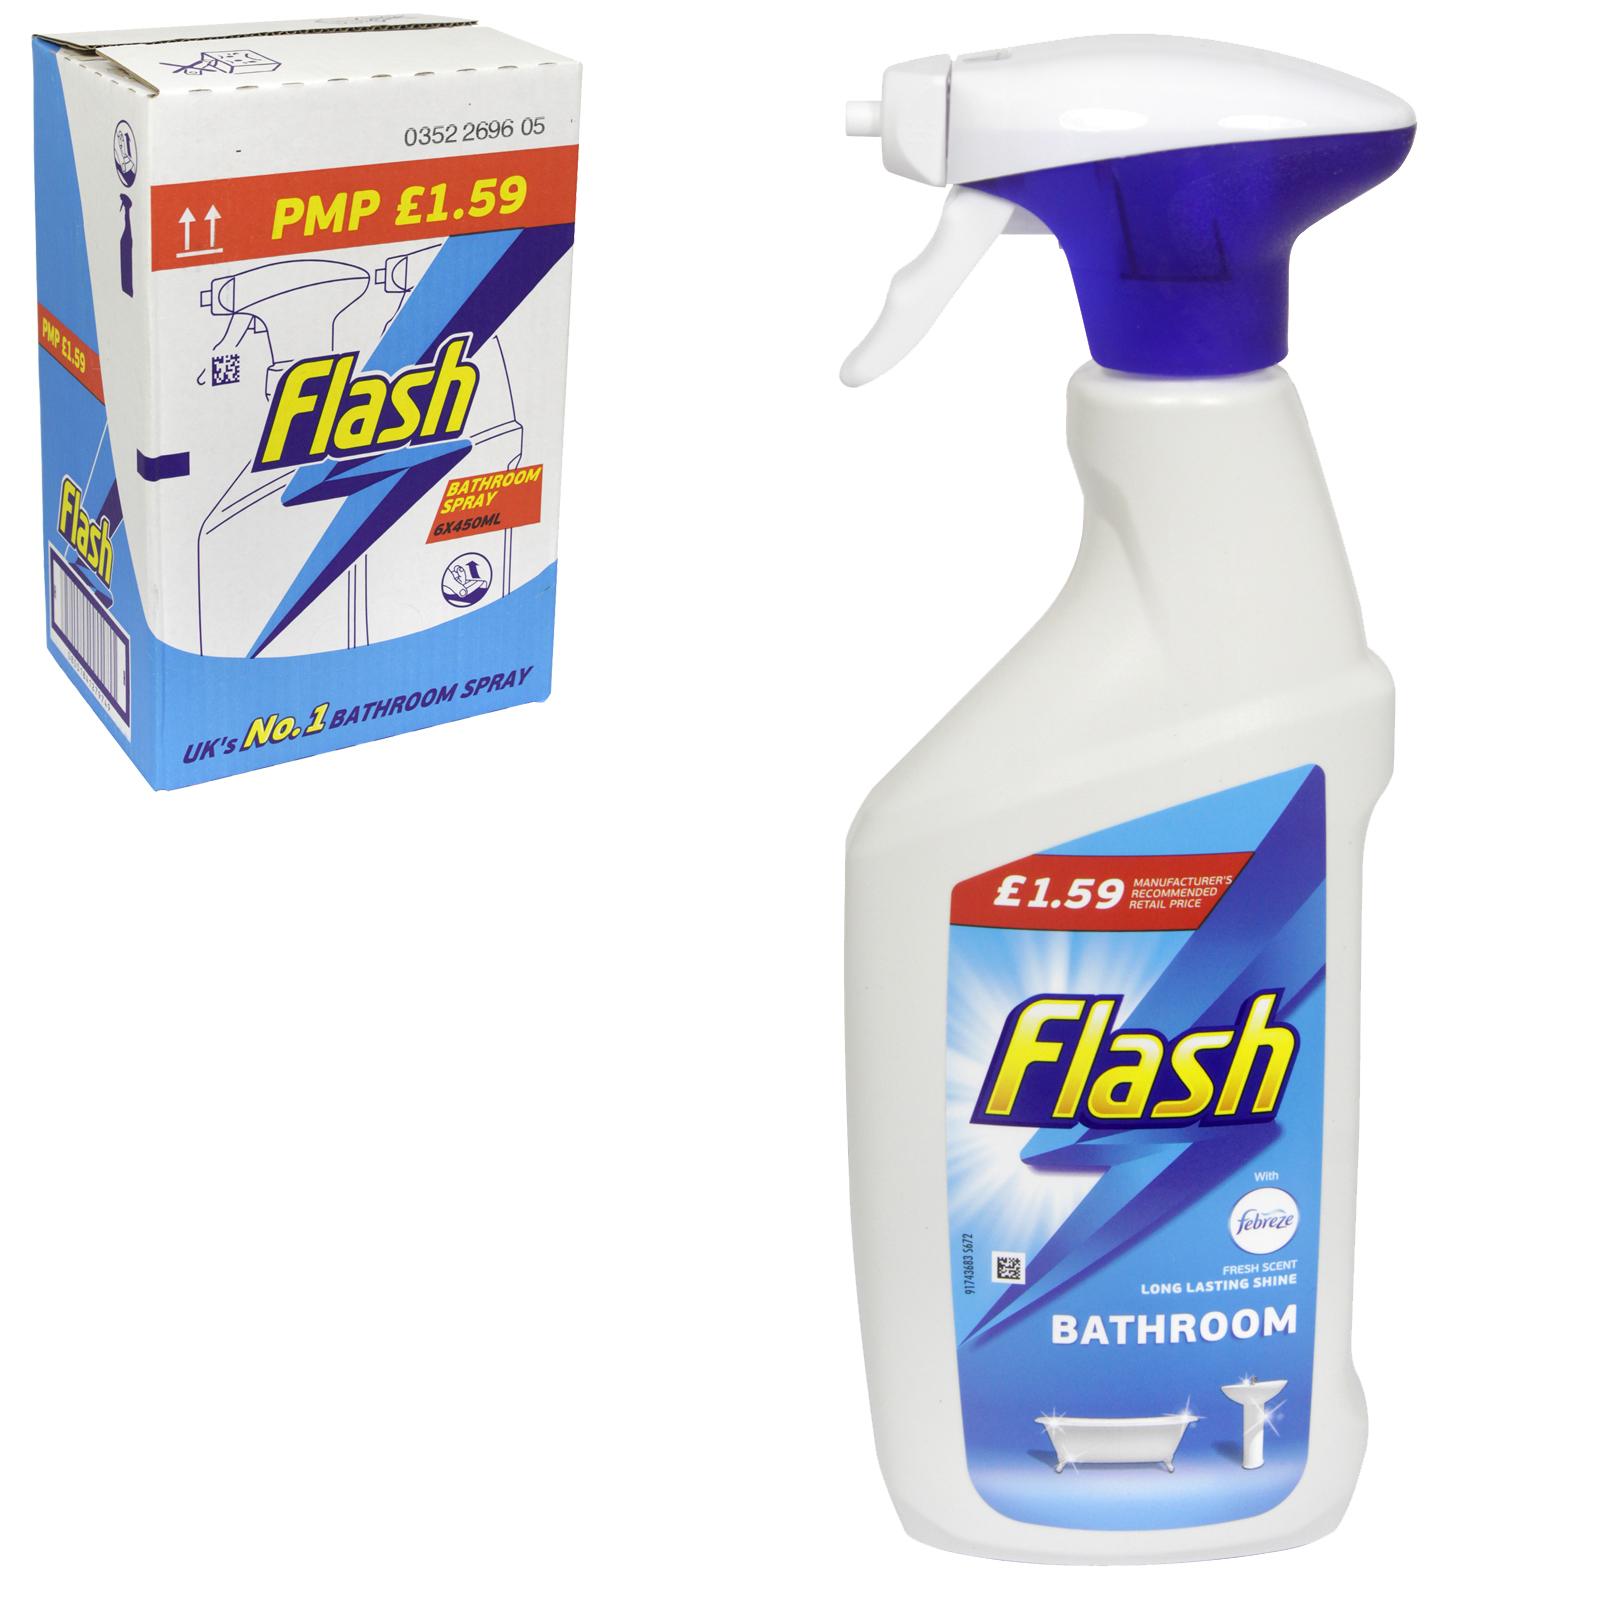 FLASH SPRAY 500ML BATHROOM PM £1.99 X6